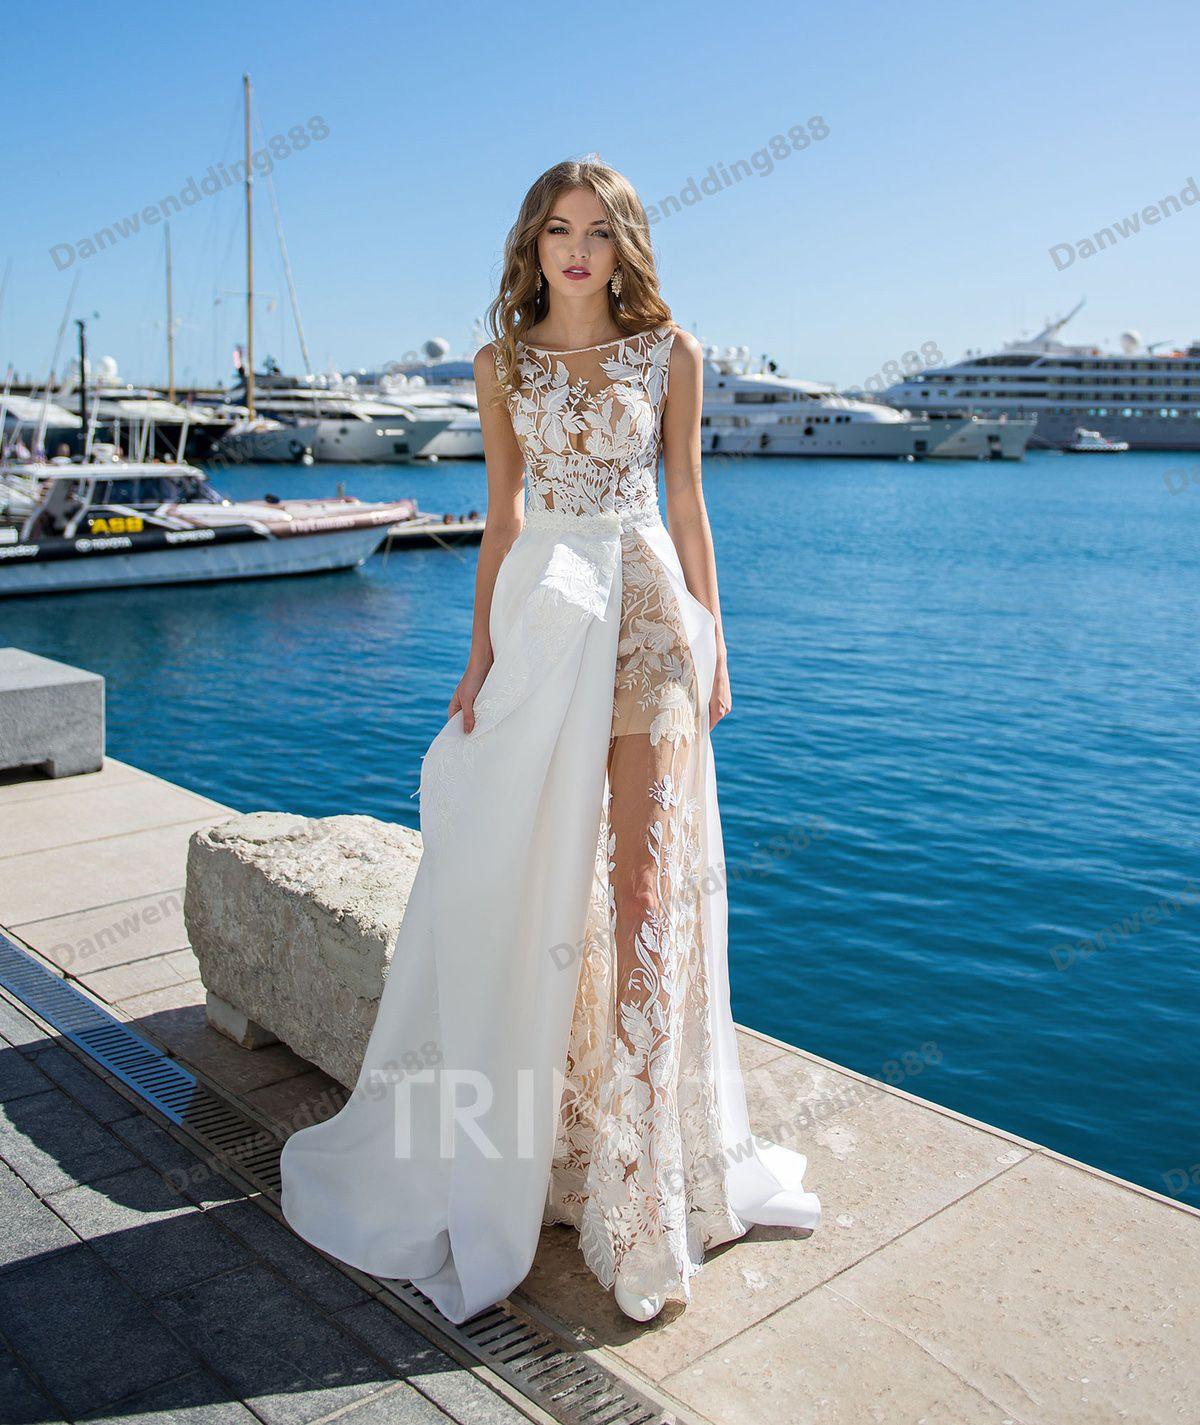 Beauty White Champagne Lace Organza Applique Sheath Wedding Dresses Bridal  Pageant Dresses Wedding Attire Dresses Custom Size 2 16 ZW713274 Dresses  Designer ... 898ac564513a